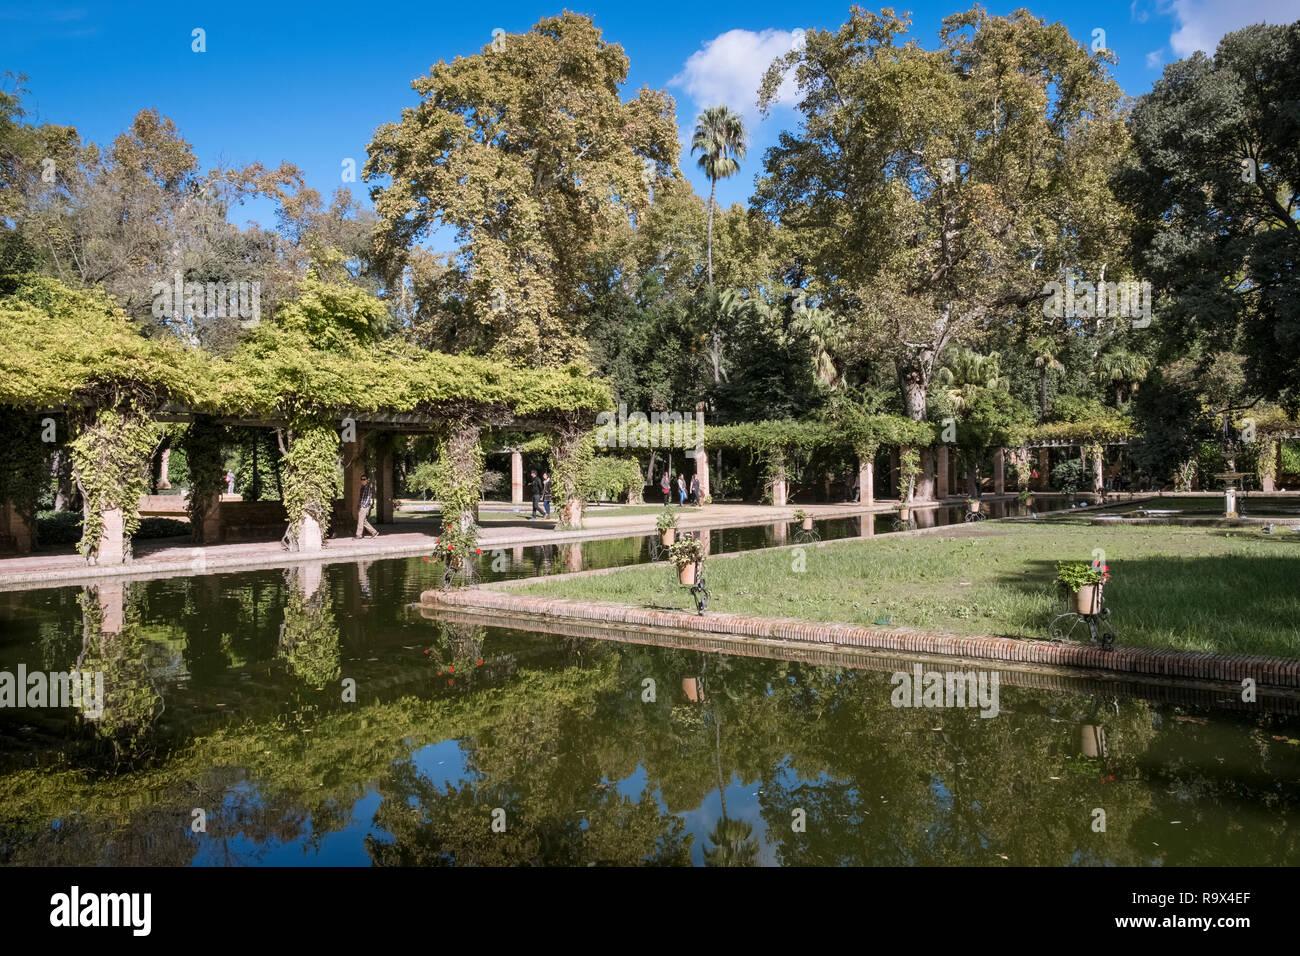 Gardens Inside Maria Luisa Park Parque De Maria Luisa Seville